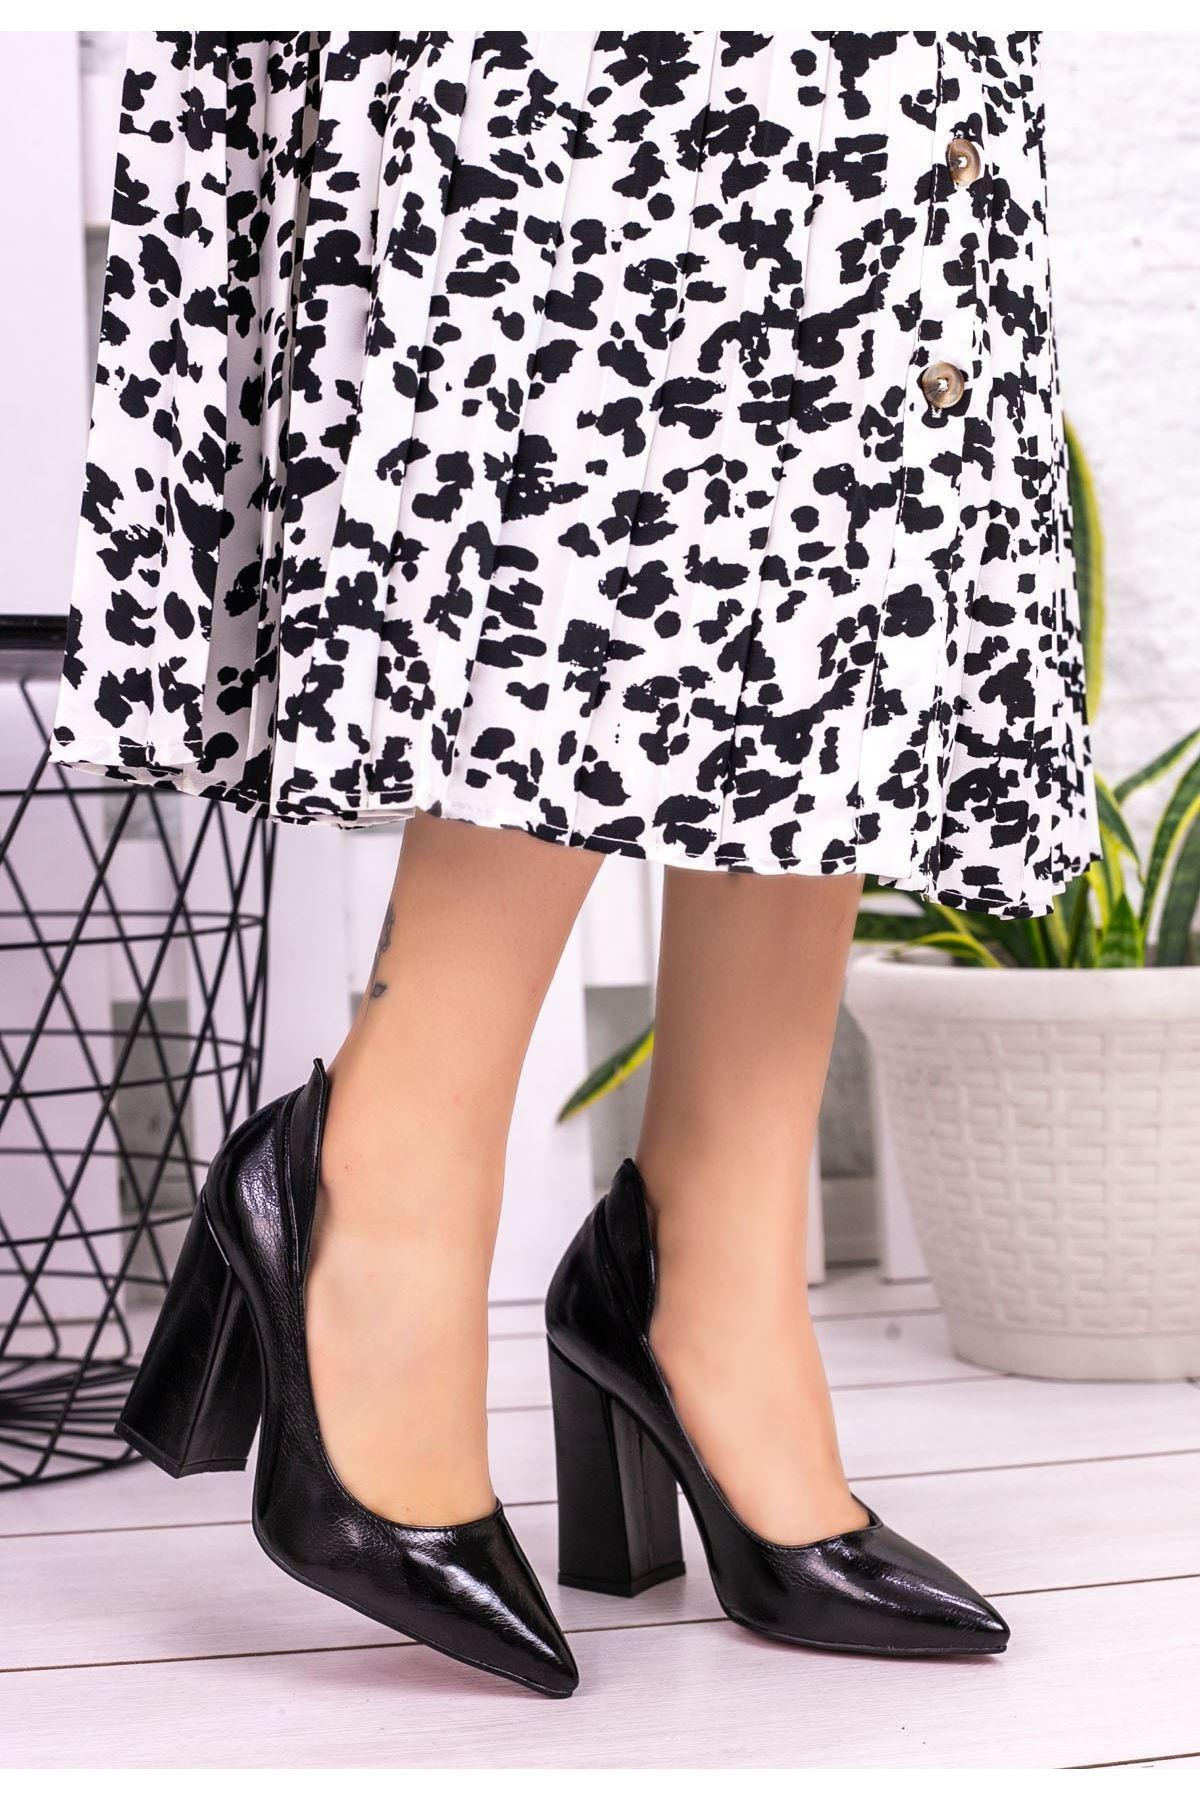 Amoj Siyah Rugan Topuklu Ayakkabı